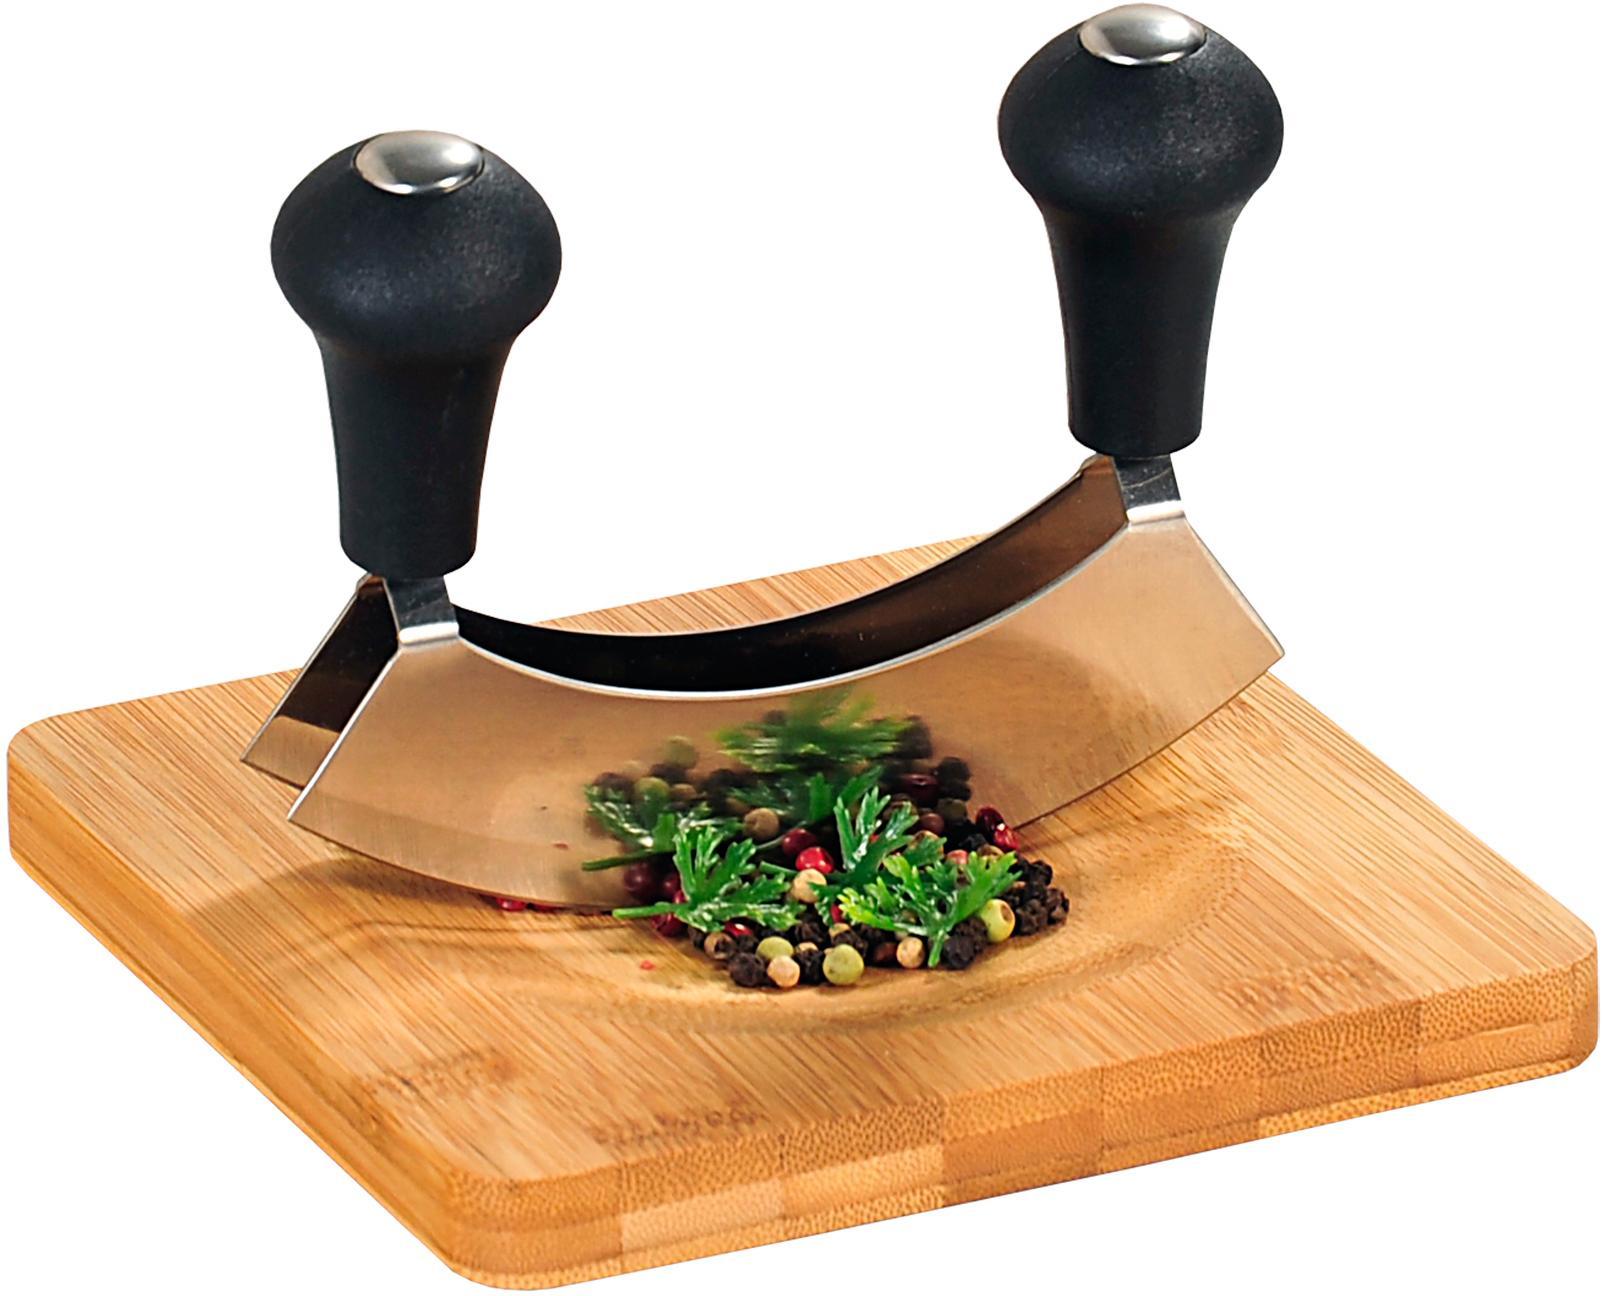 KESPER for kitchen & home Kräuterschneidebrett Bambus Preisvergleich